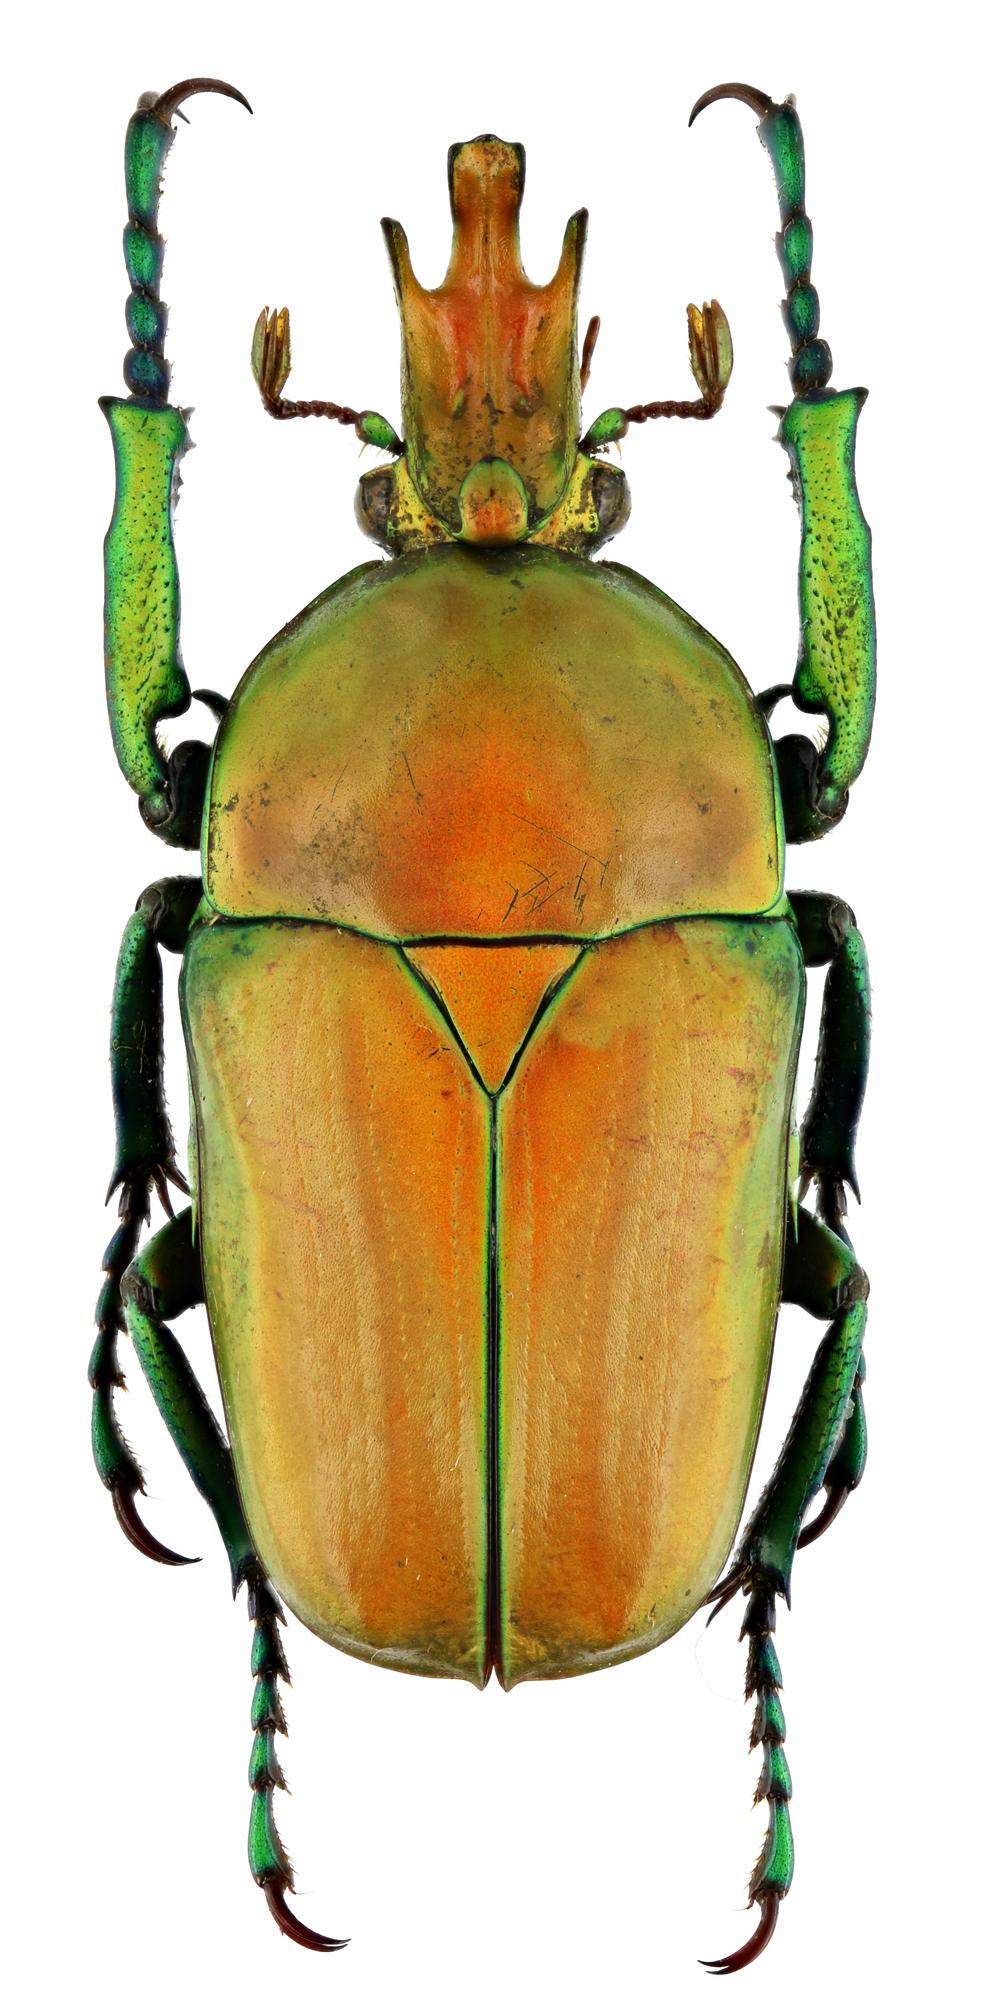 Taurhina longiceps longiceps 16554zs64.jpg